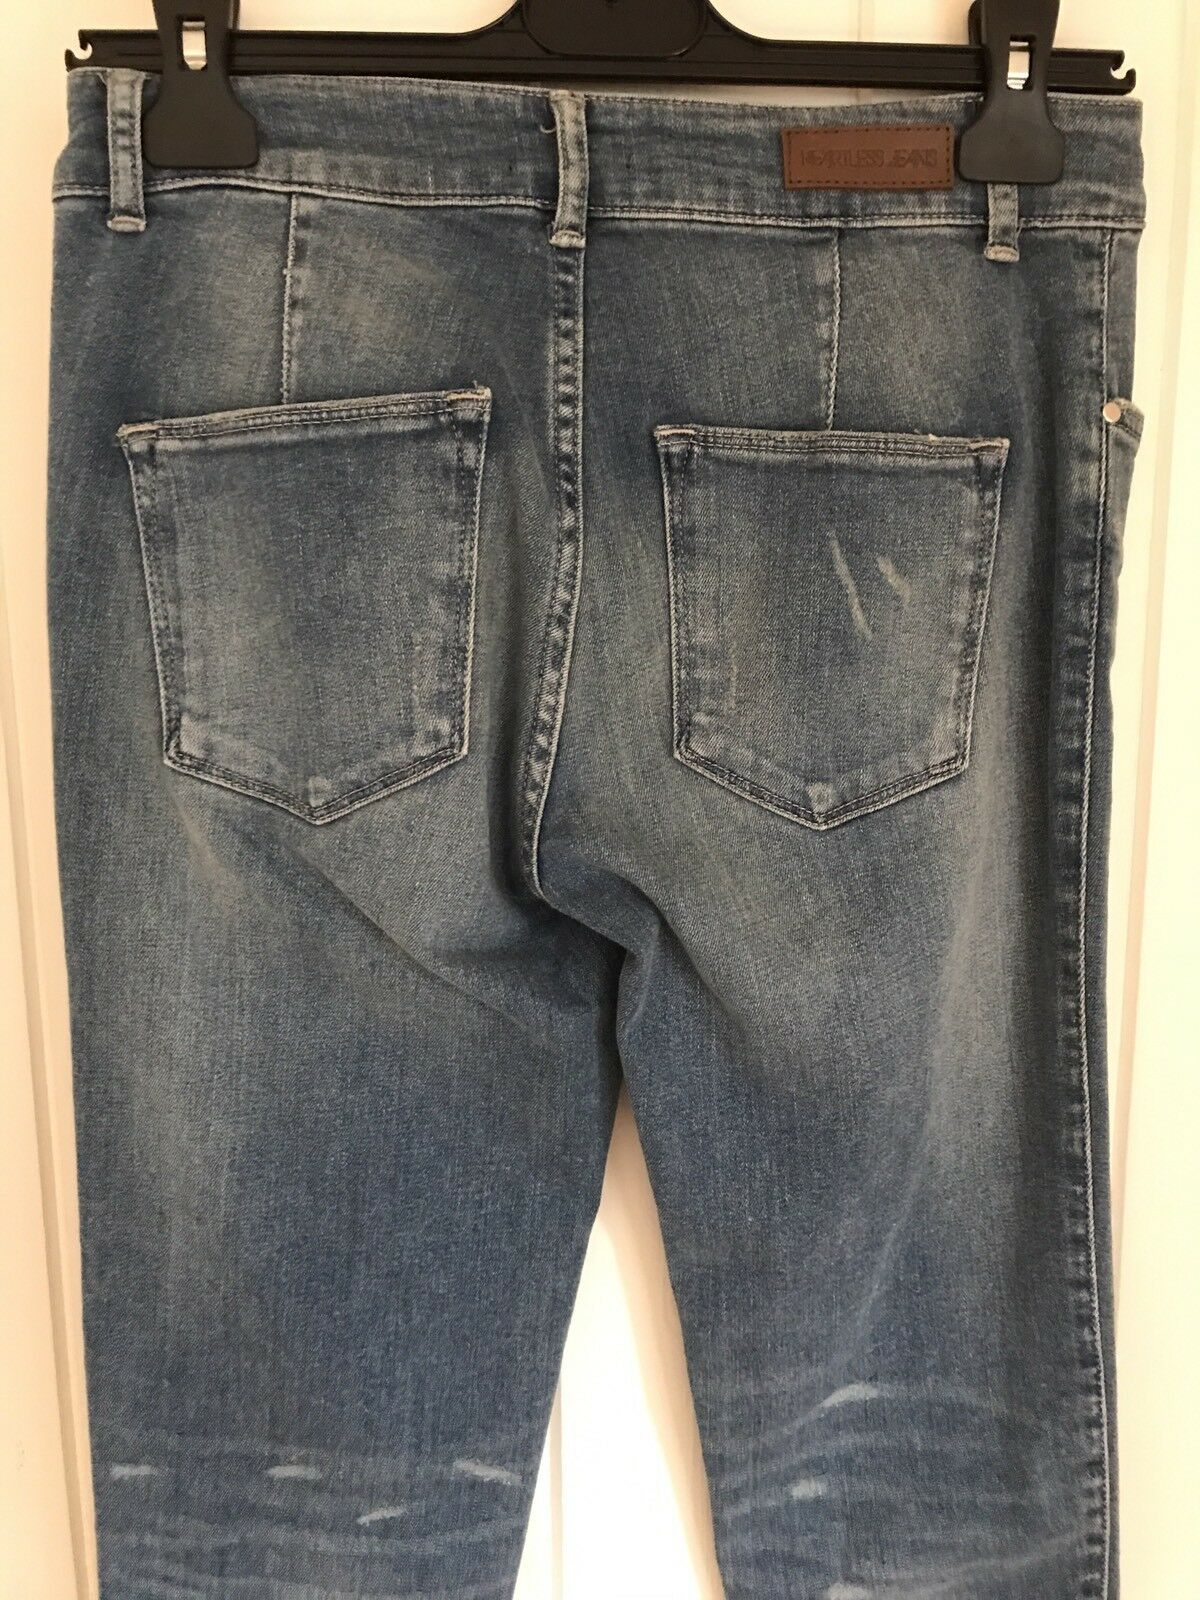 Senza Cuore da Donna Jeans Blu Denim Elasticizzato Pantaloni Pantaloni Pantaloni Girovita 29  RRP 7d2df6